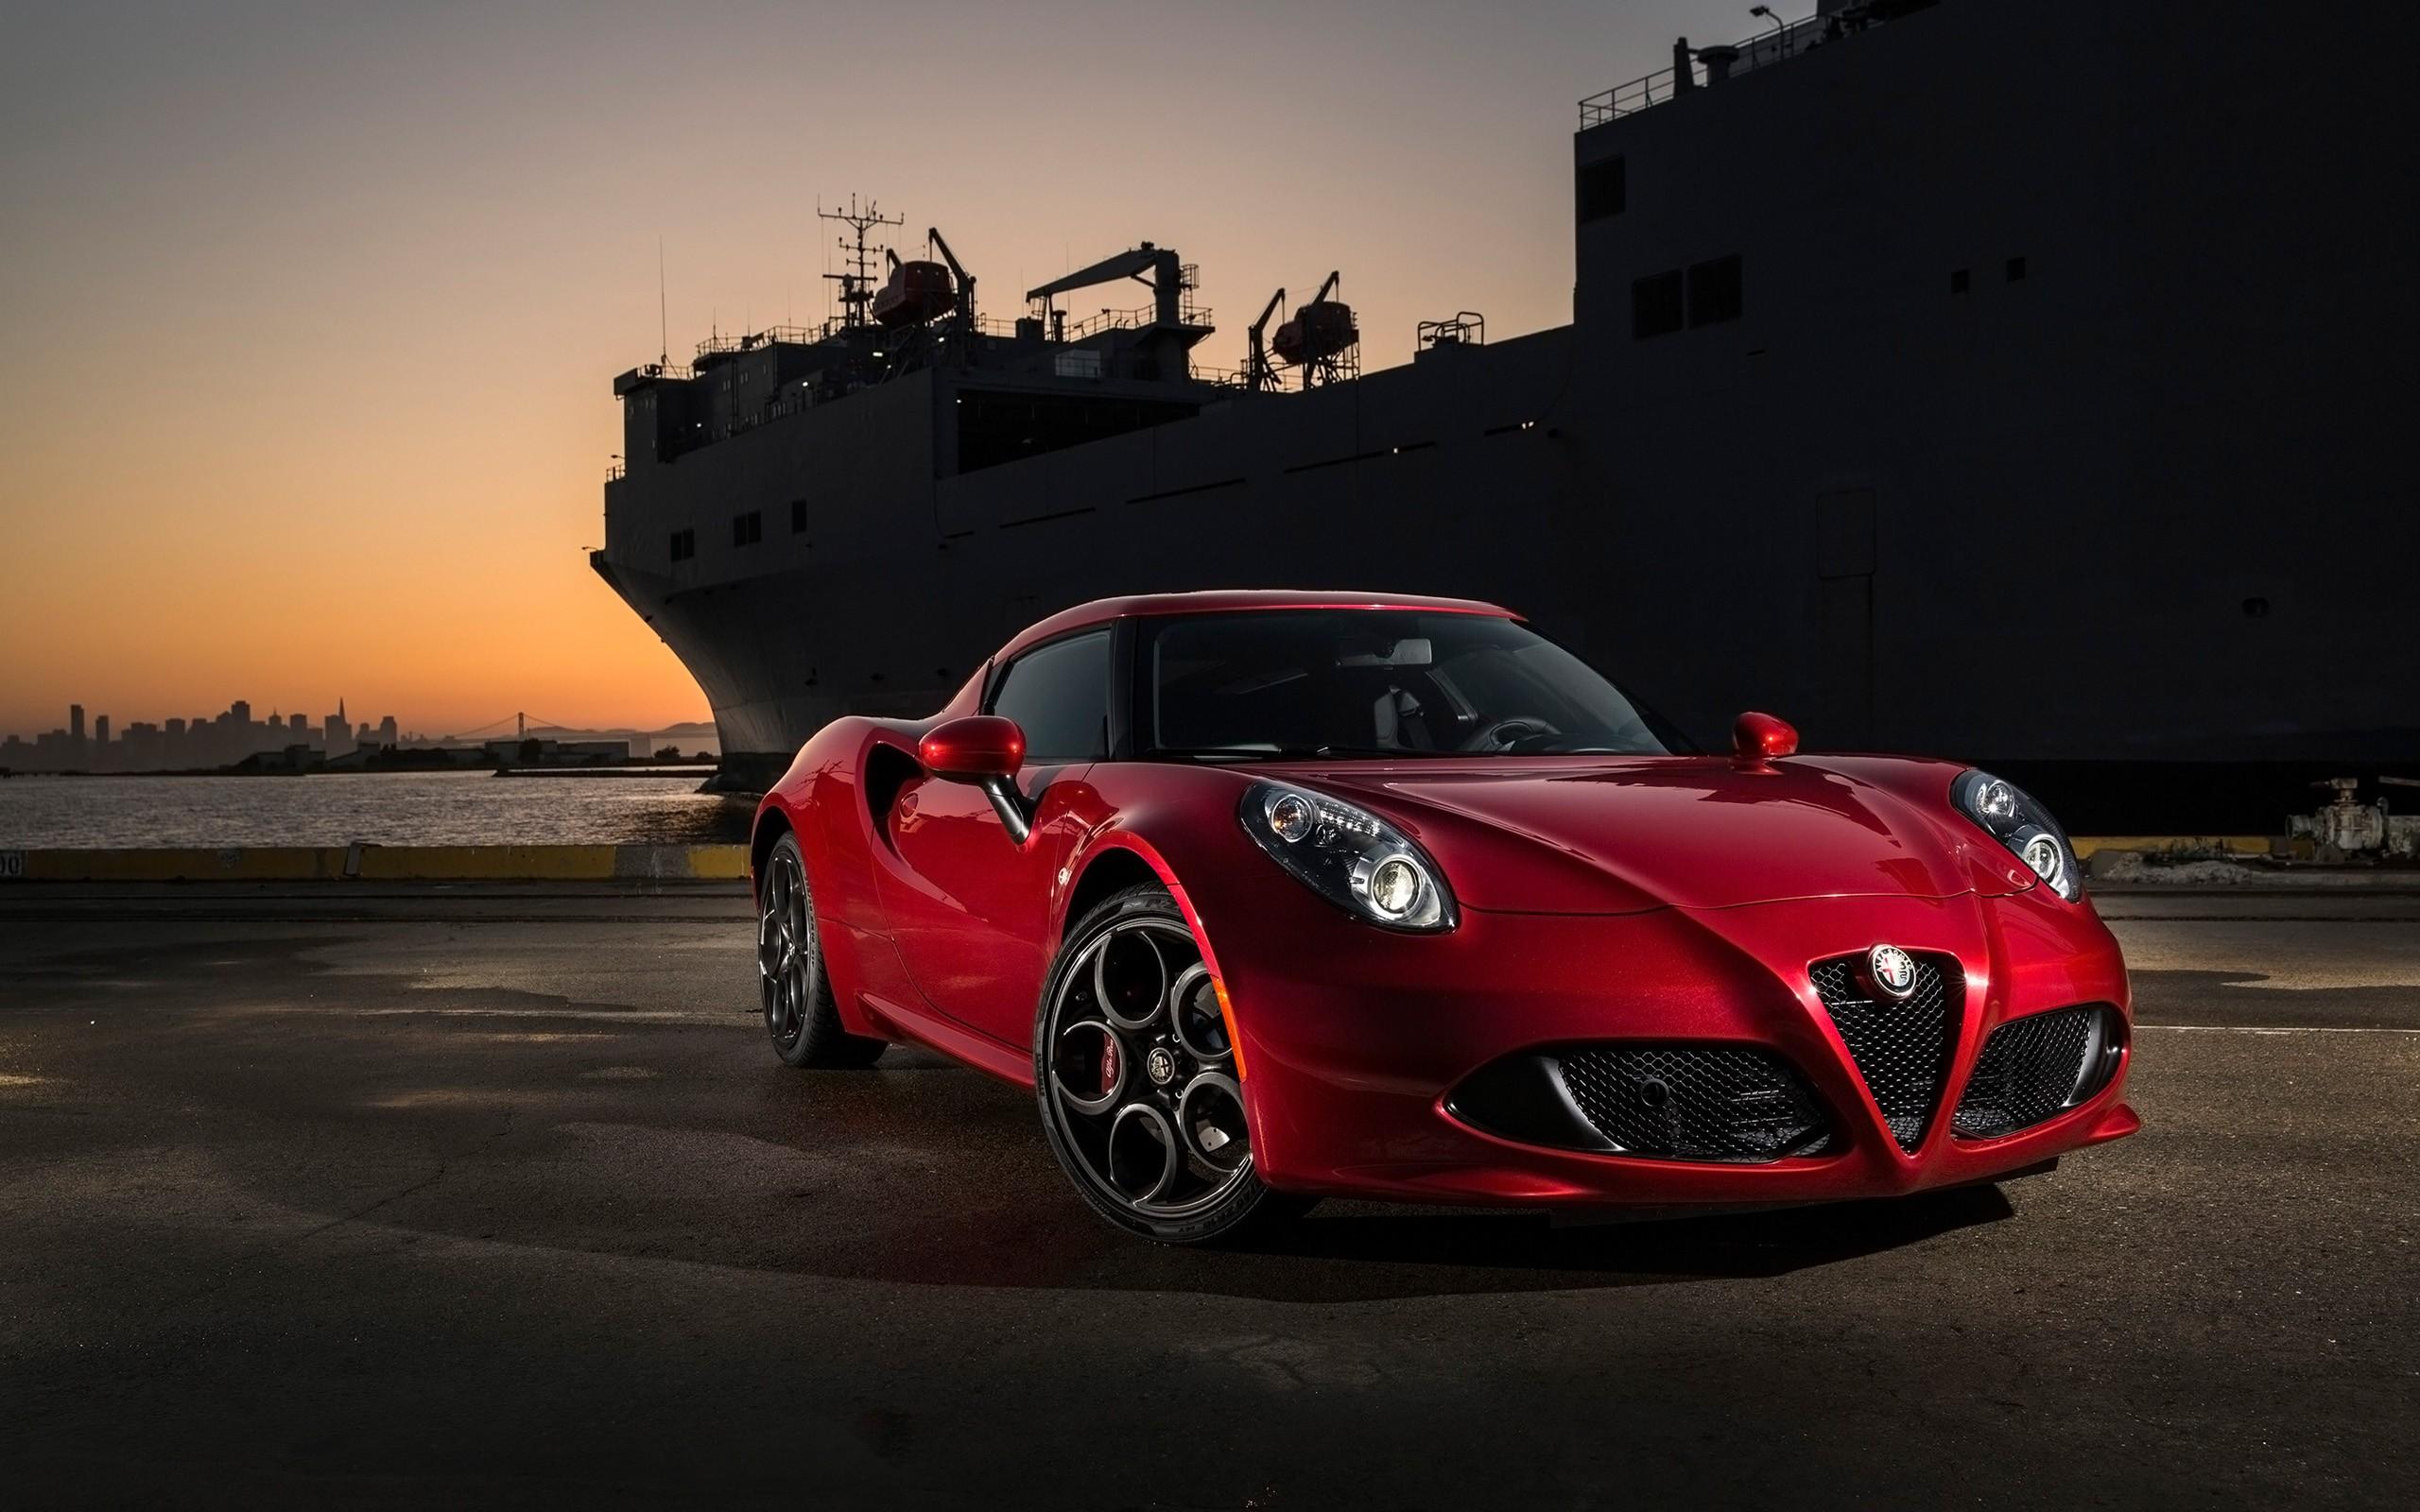 2016 Alfa Romeo 4C 2 Wallpaper HD Car Wallpapers ID 6651